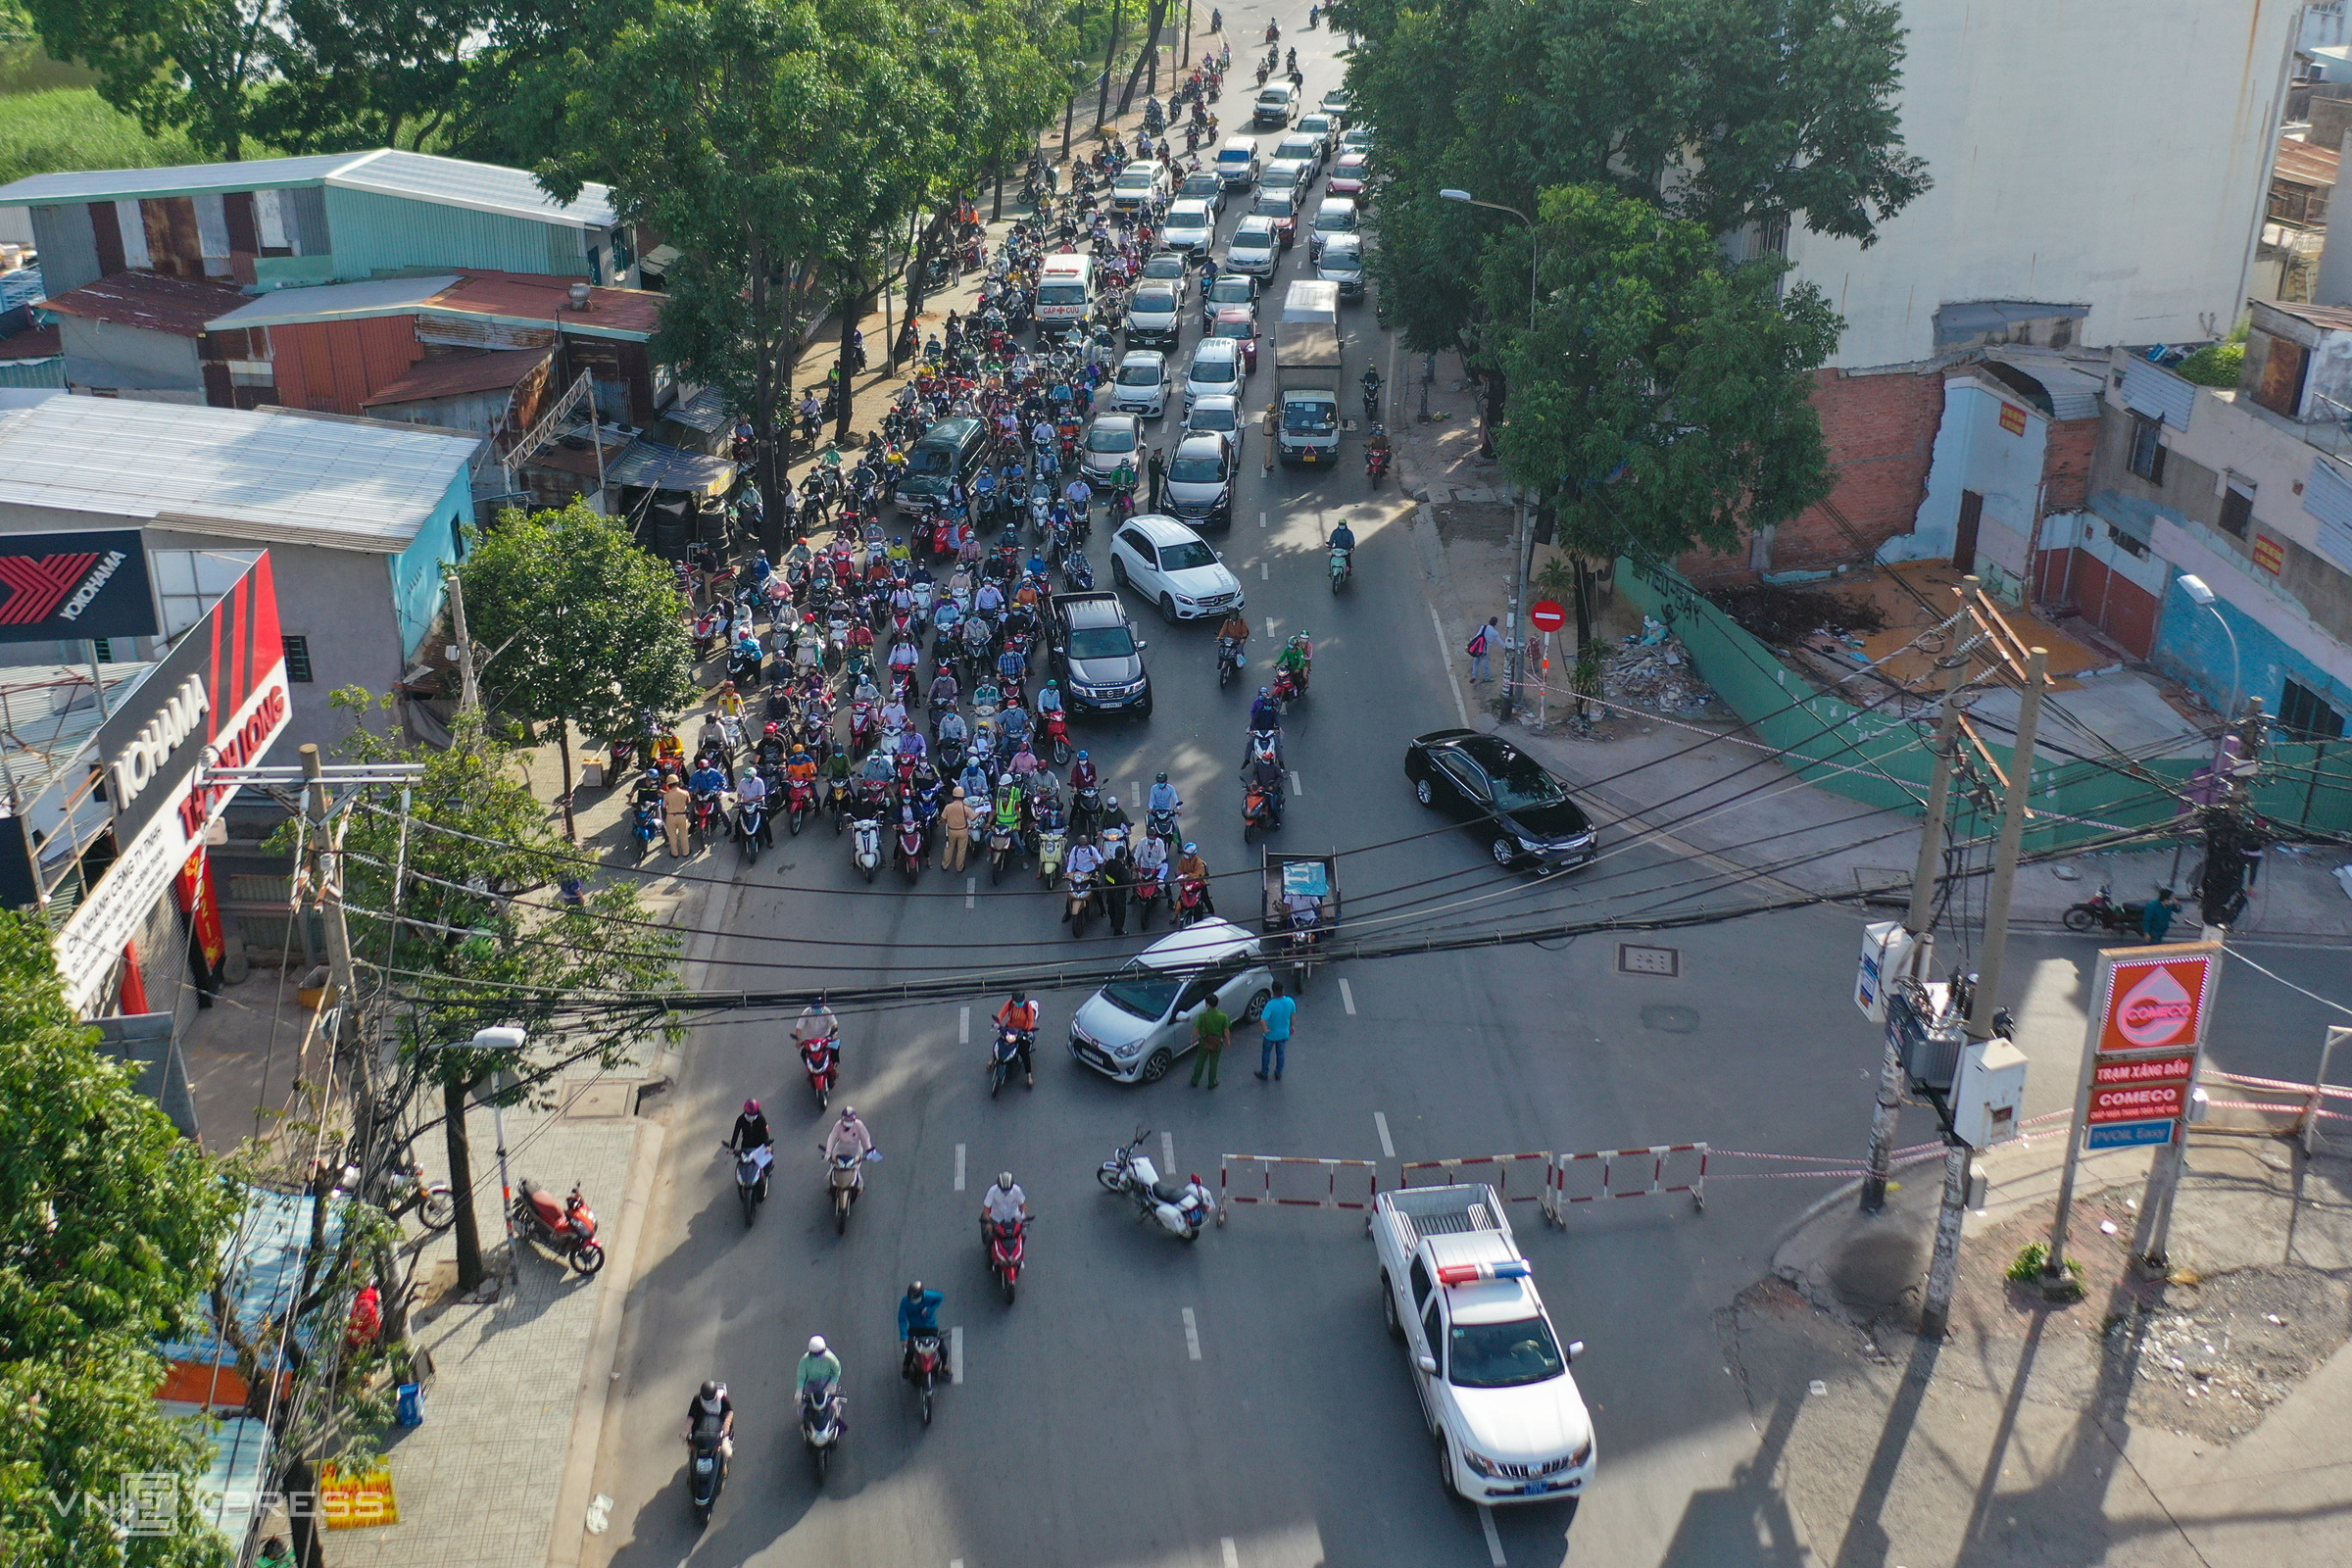 Covid checkpoints paralyze HCMC traffic